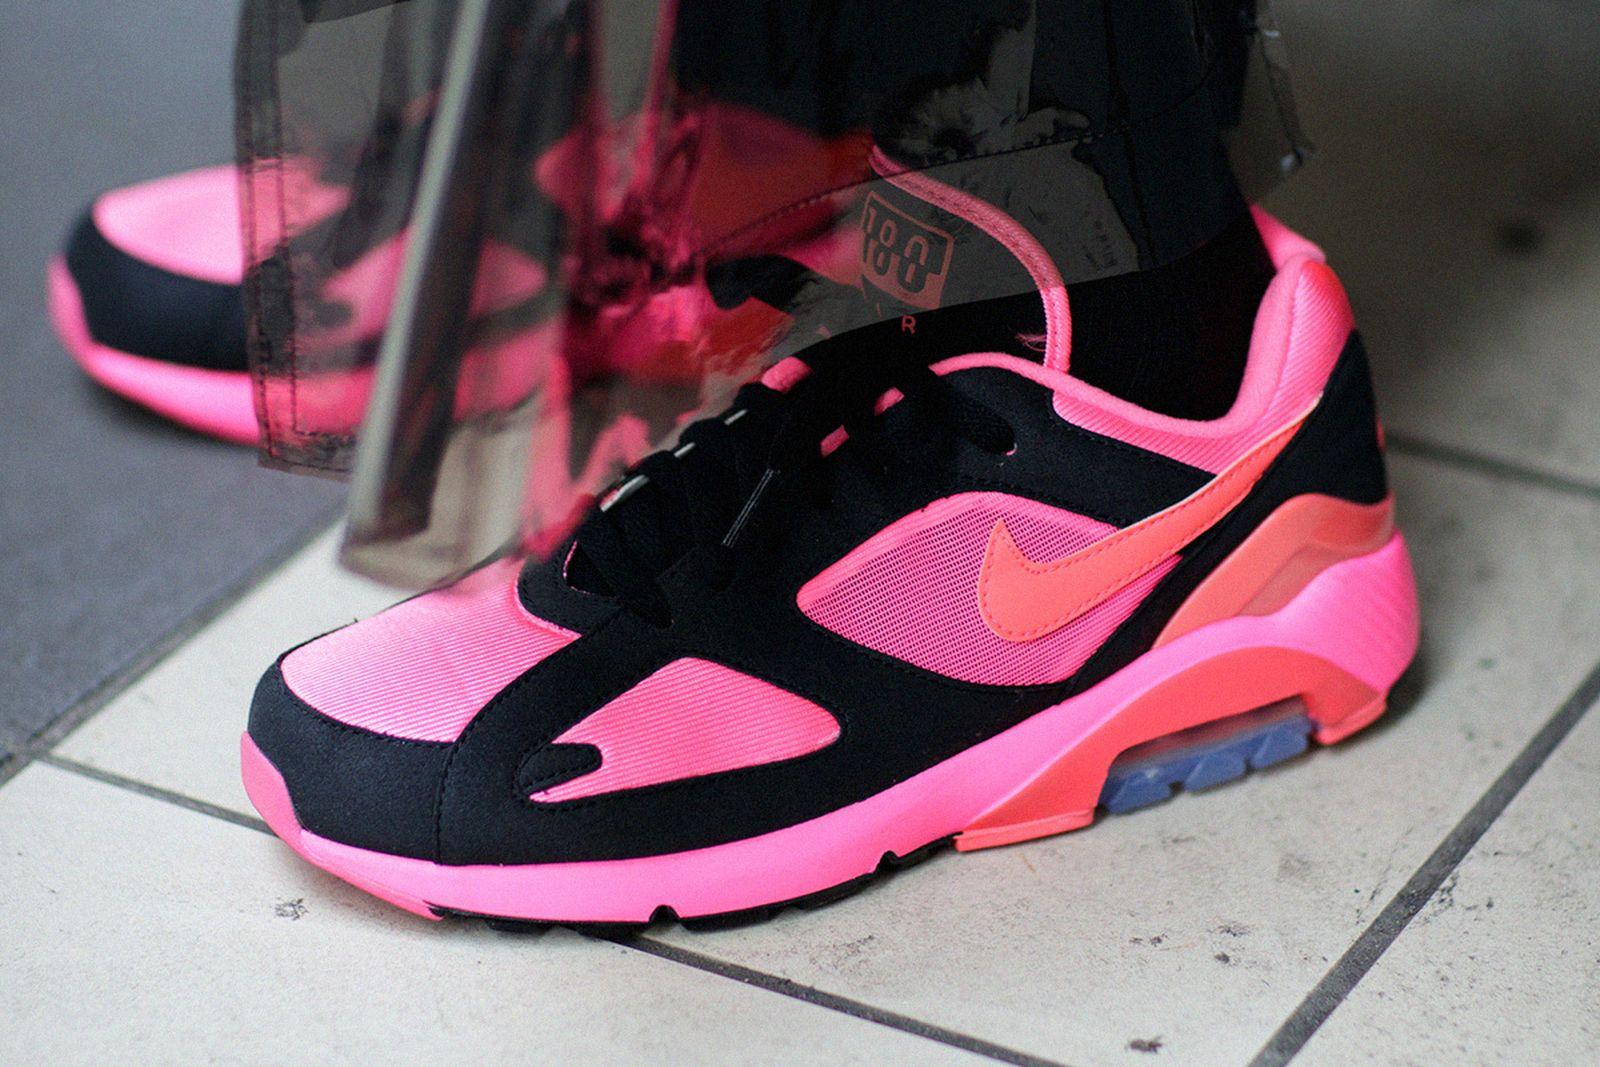 best-comme-des-garcons-sneakers-01